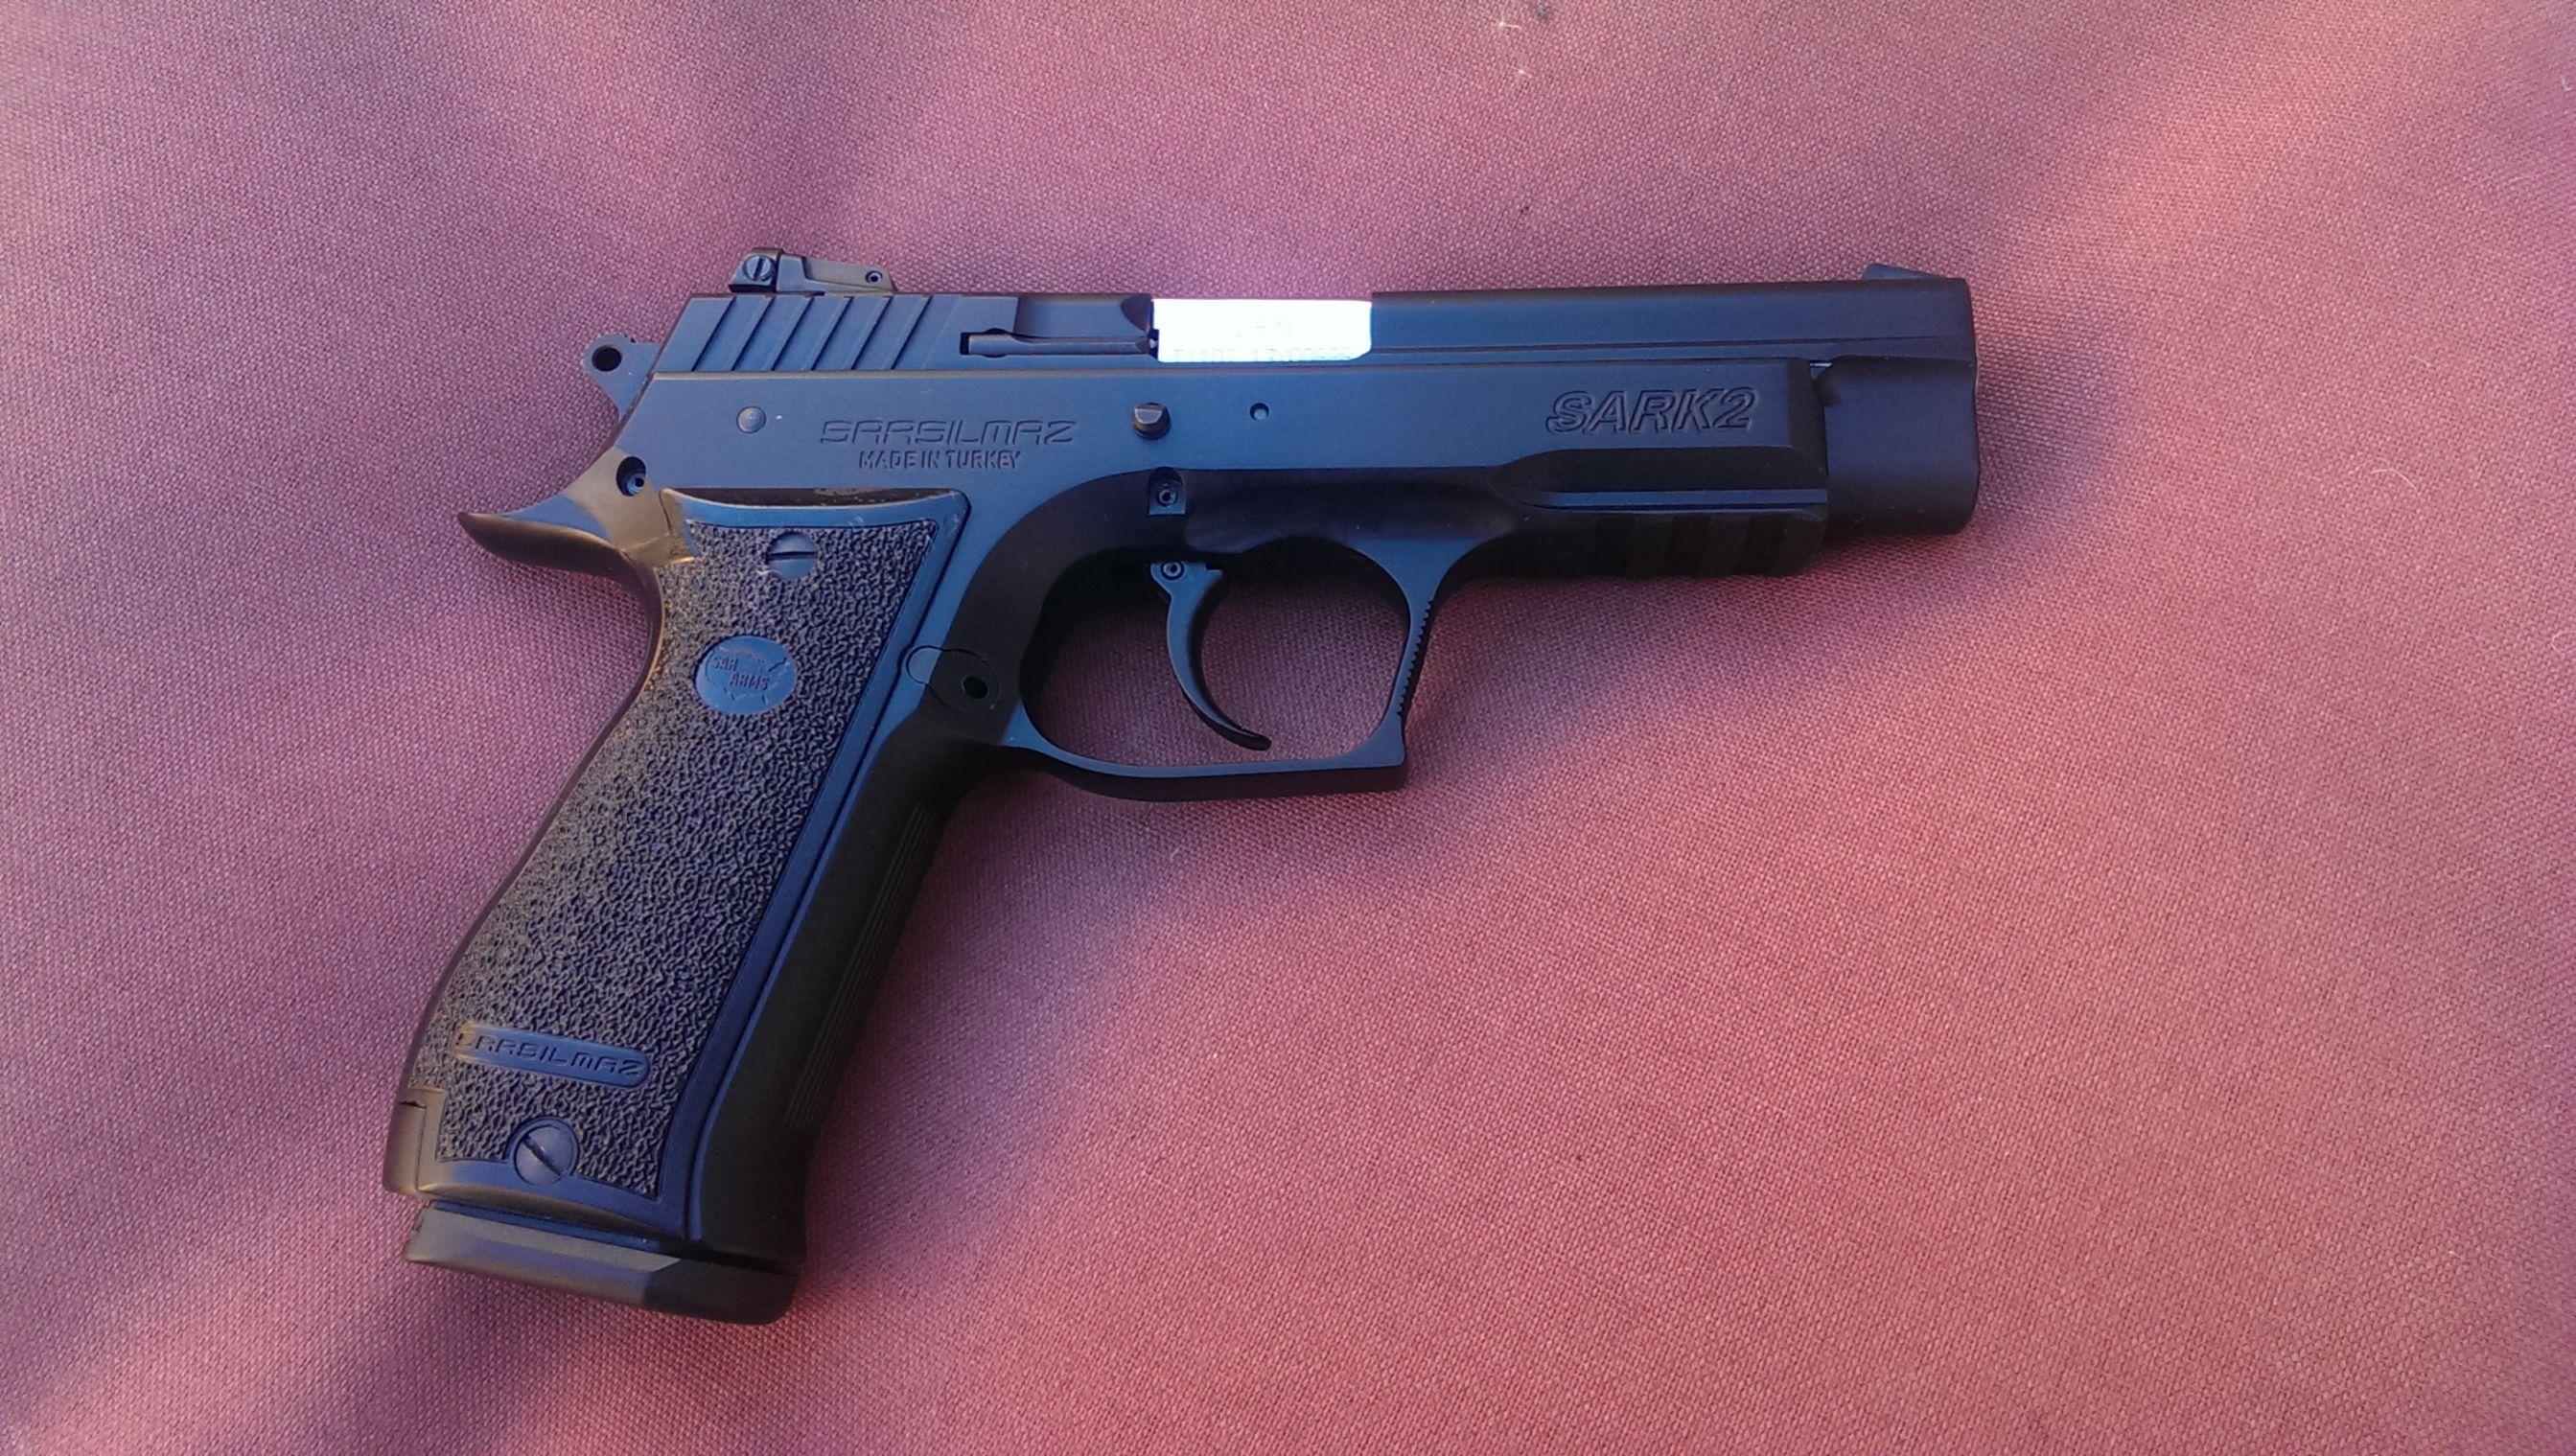 Sarsilmaz SAR K2 | Hello Gorgeous | Guns, Hand guns, Firearms